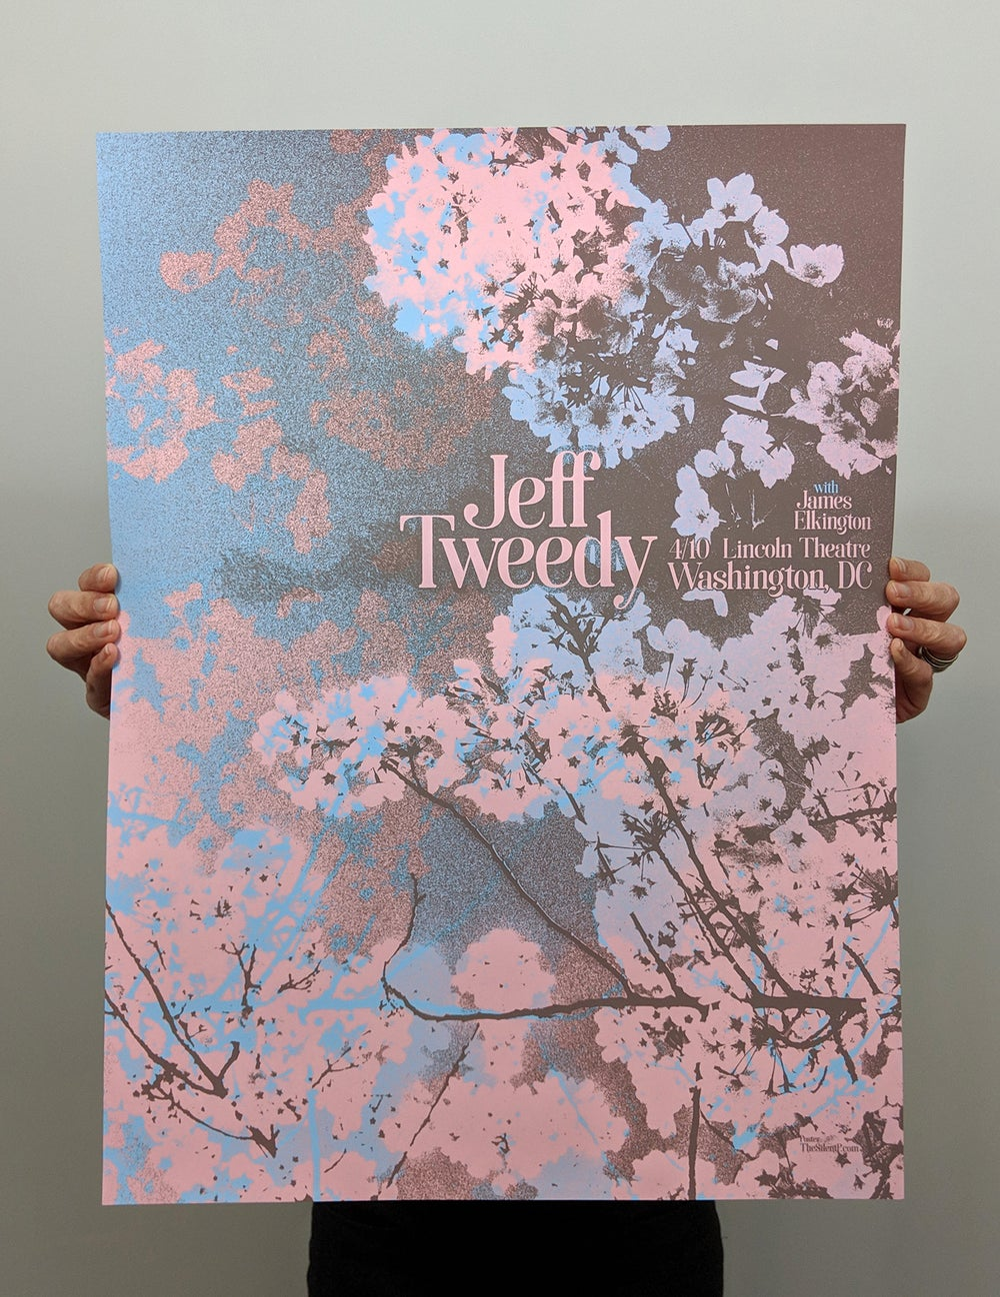 Jeff Tweedy, Washington, DC